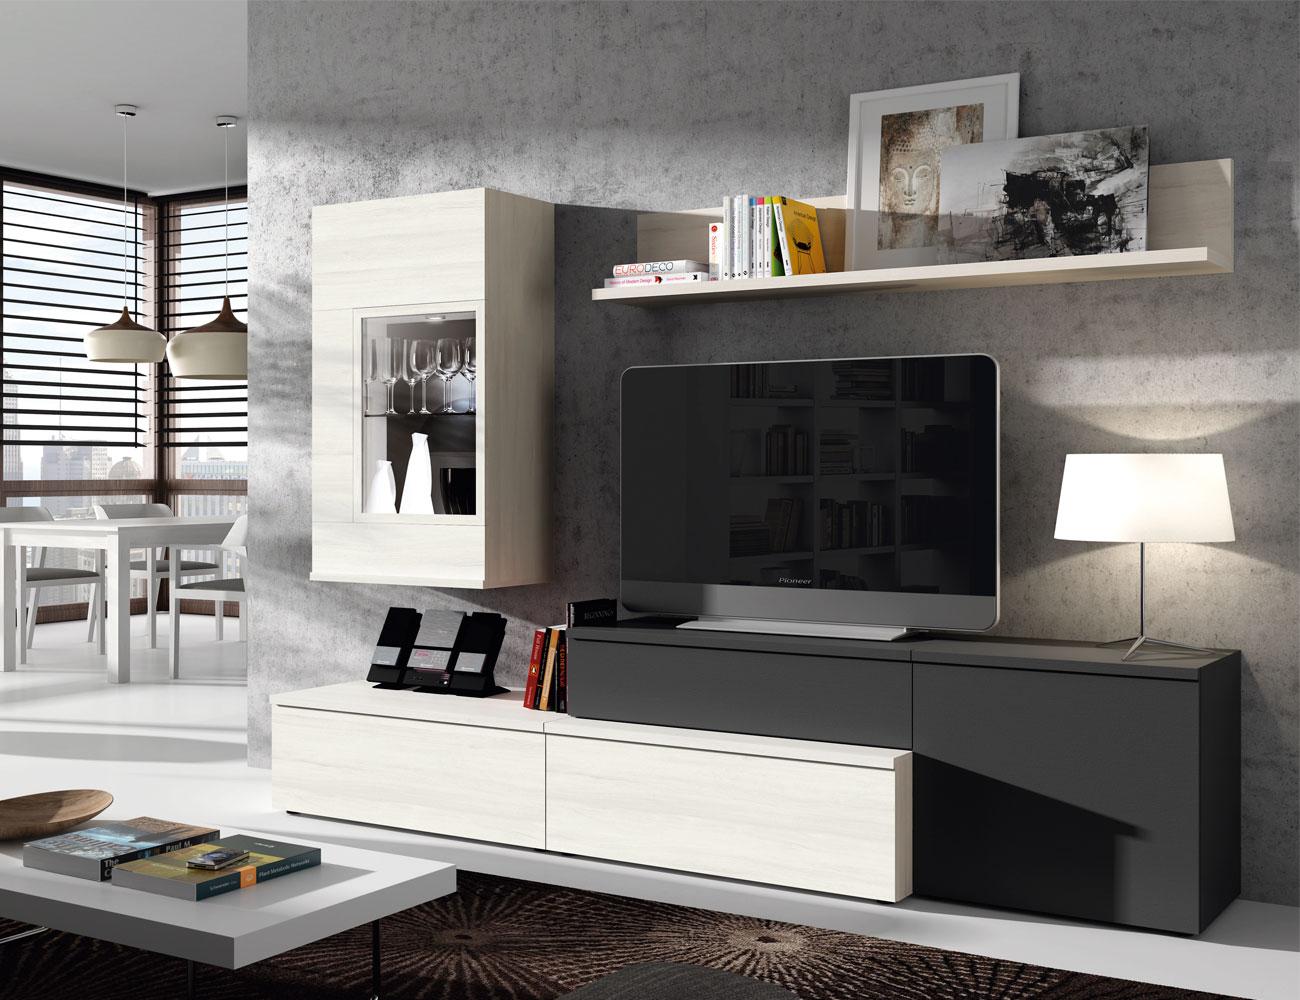 603 mueble salon comedor leds polar antracita